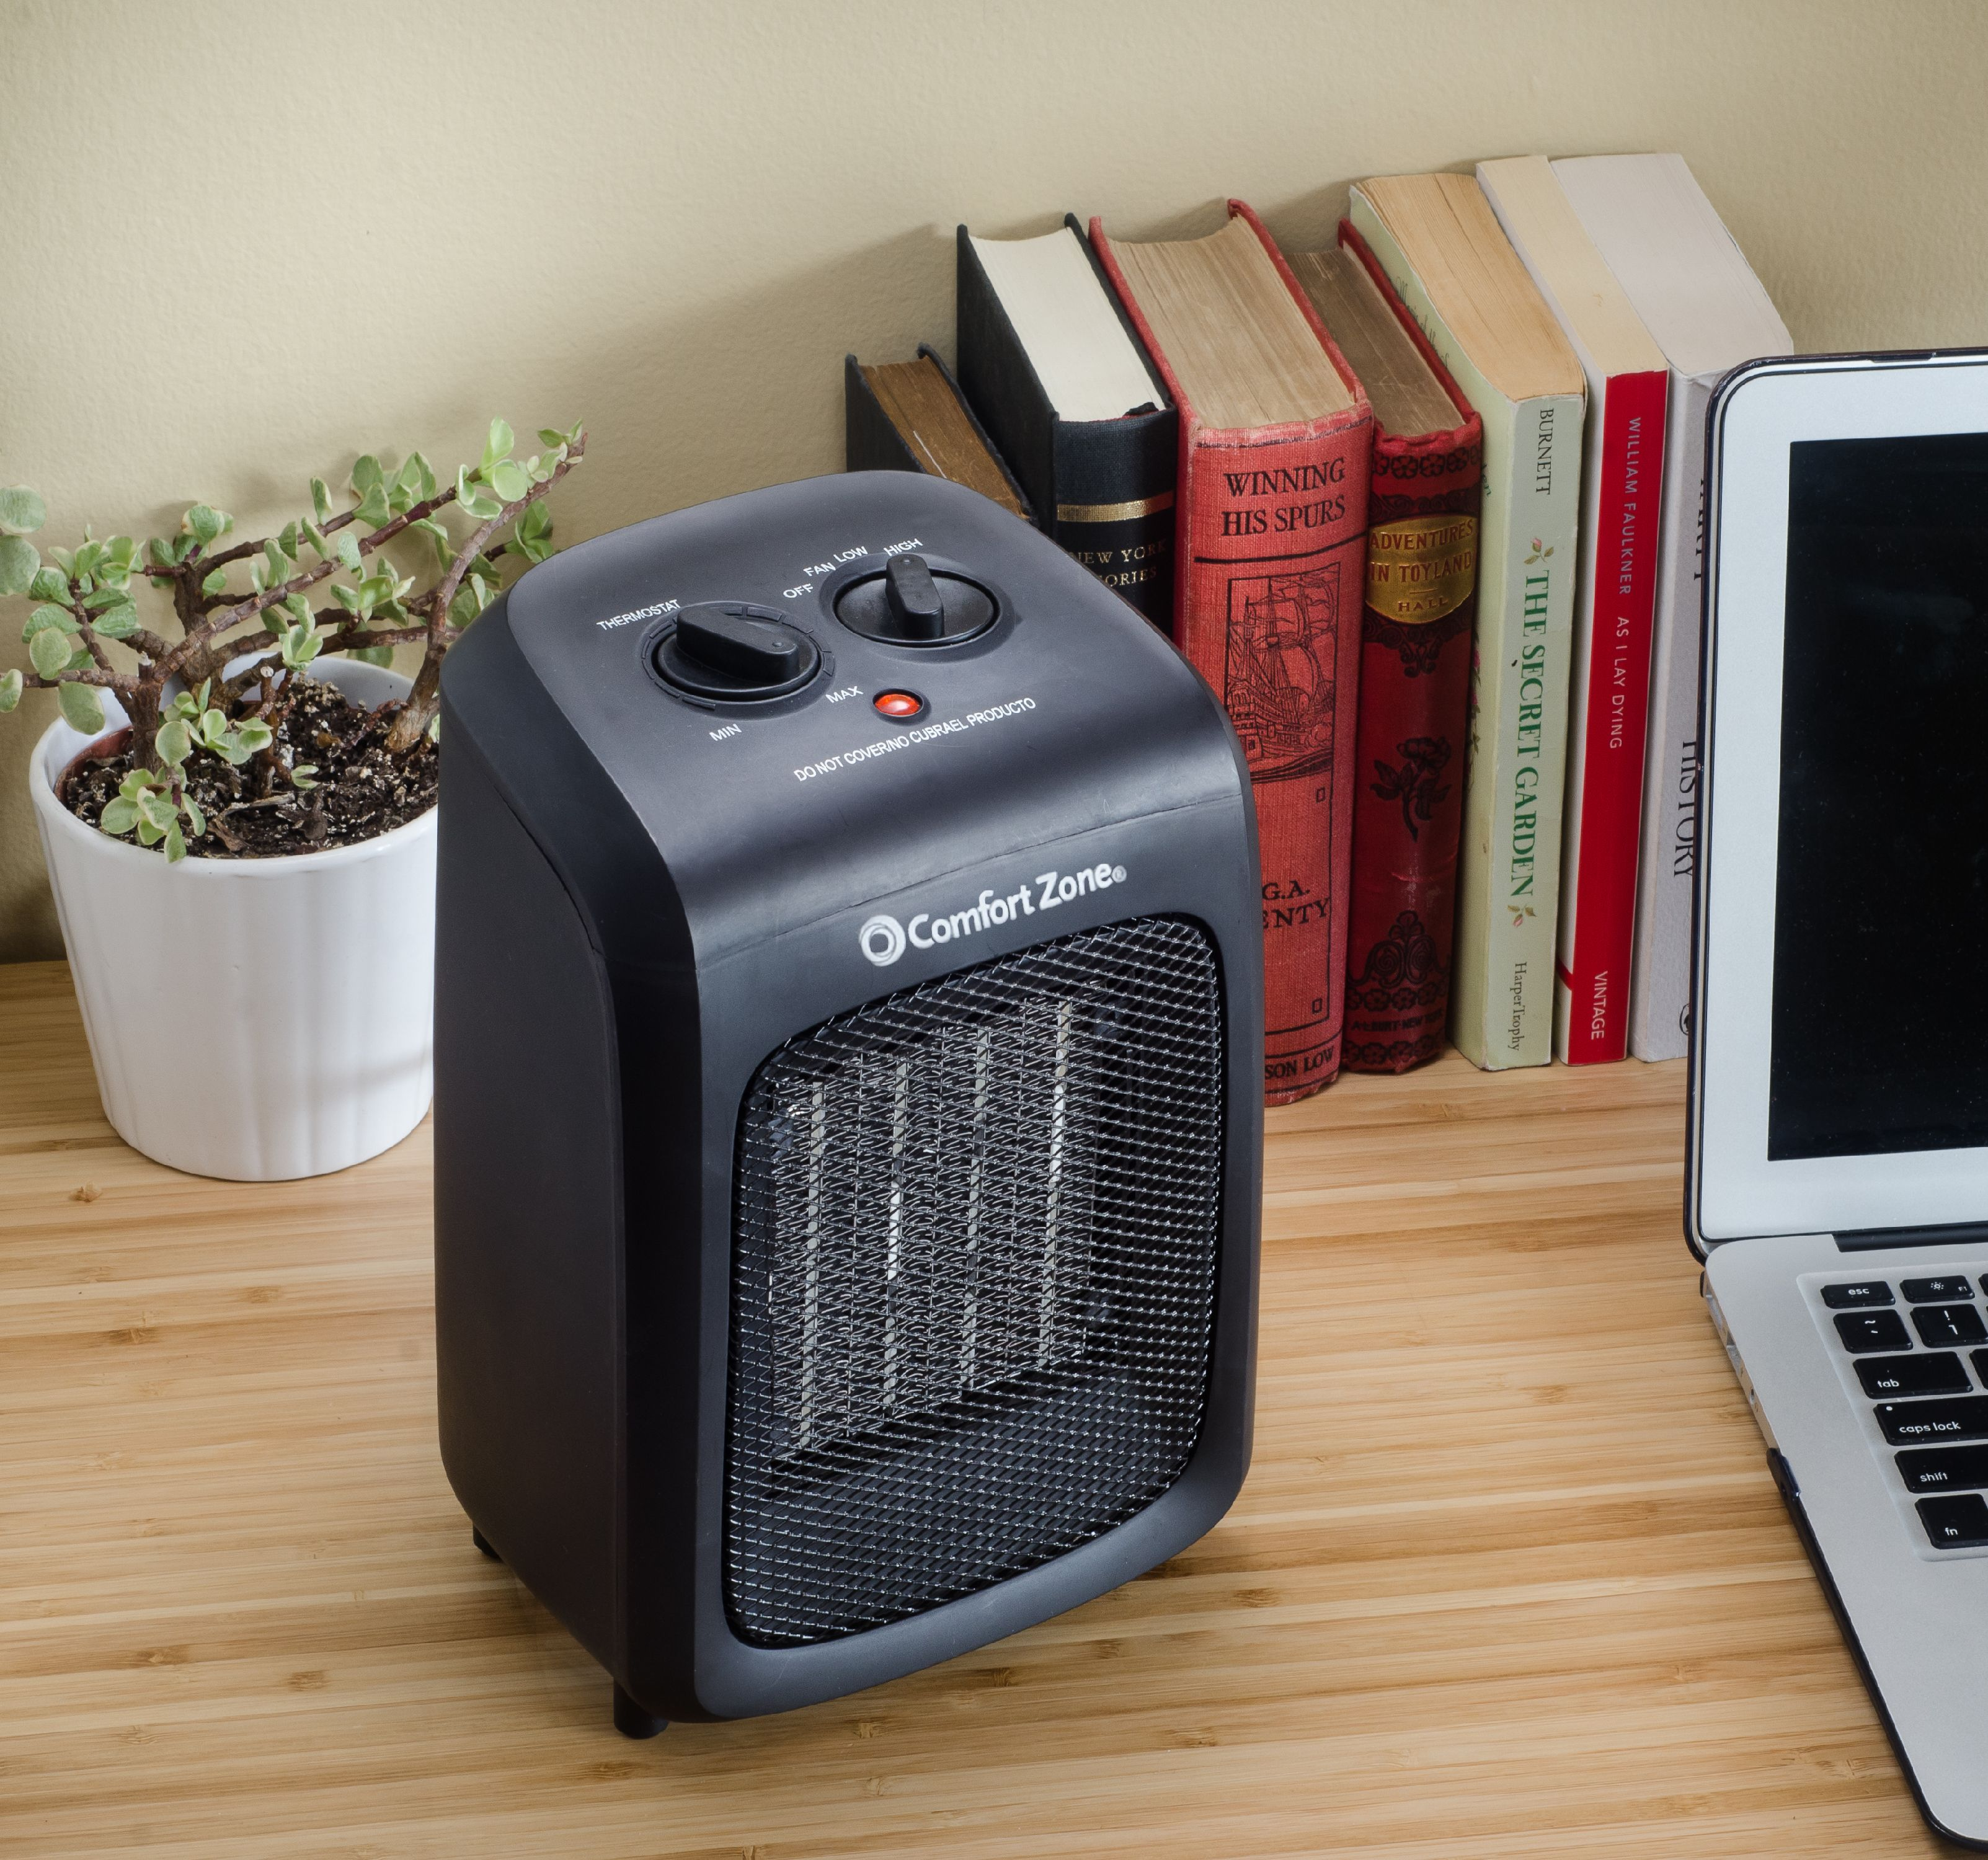 Surprising Comfort Zone Ceramic Heater Black Cz446Wm Walmart Com Cjindustries Chair Design For Home Cjindustriesco